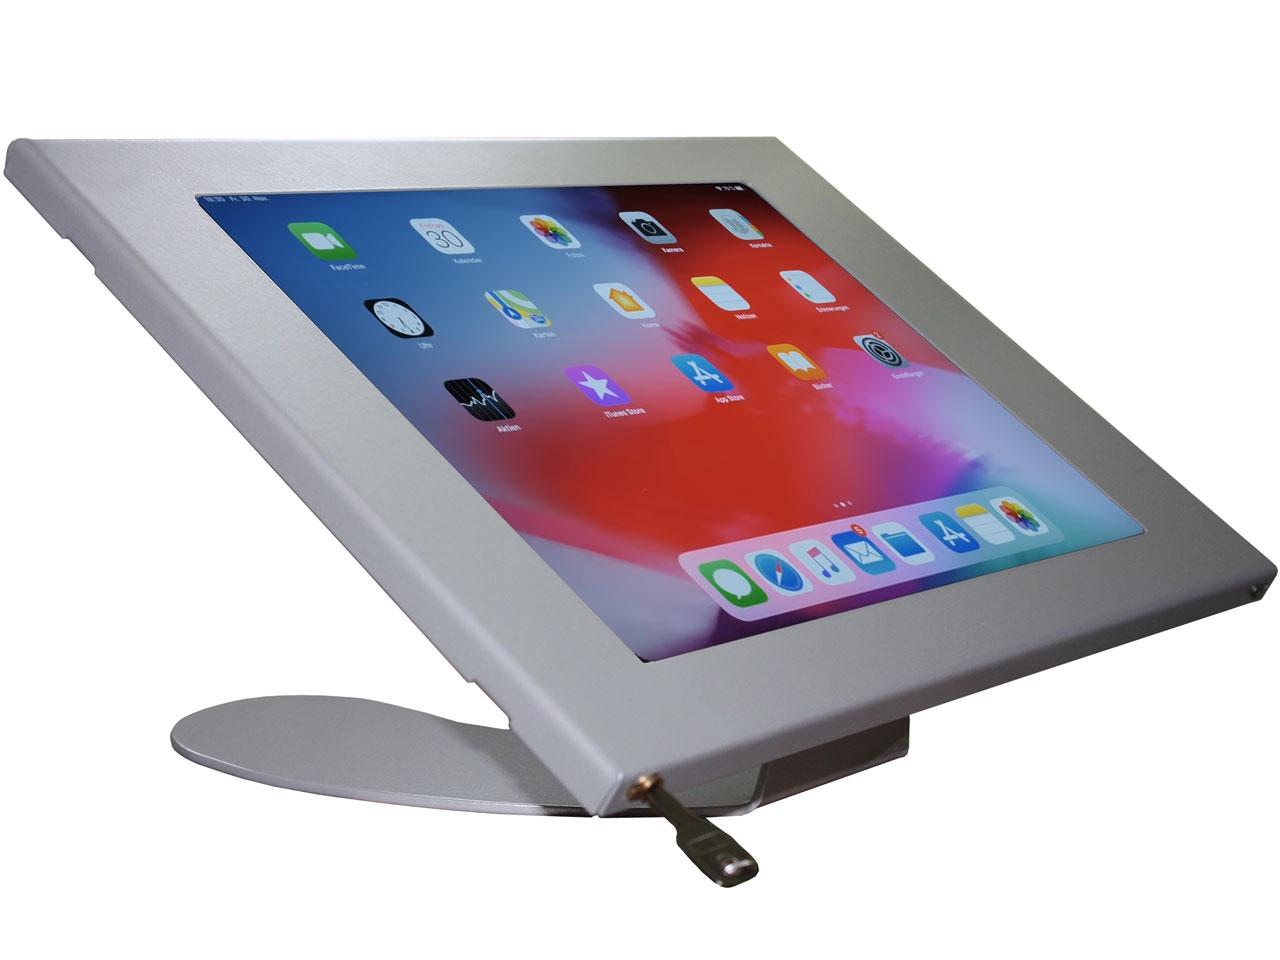 tablet schutzgeh use apple 11 zoll ipad pro g nstig kaufen cmb systeme. Black Bedroom Furniture Sets. Home Design Ideas